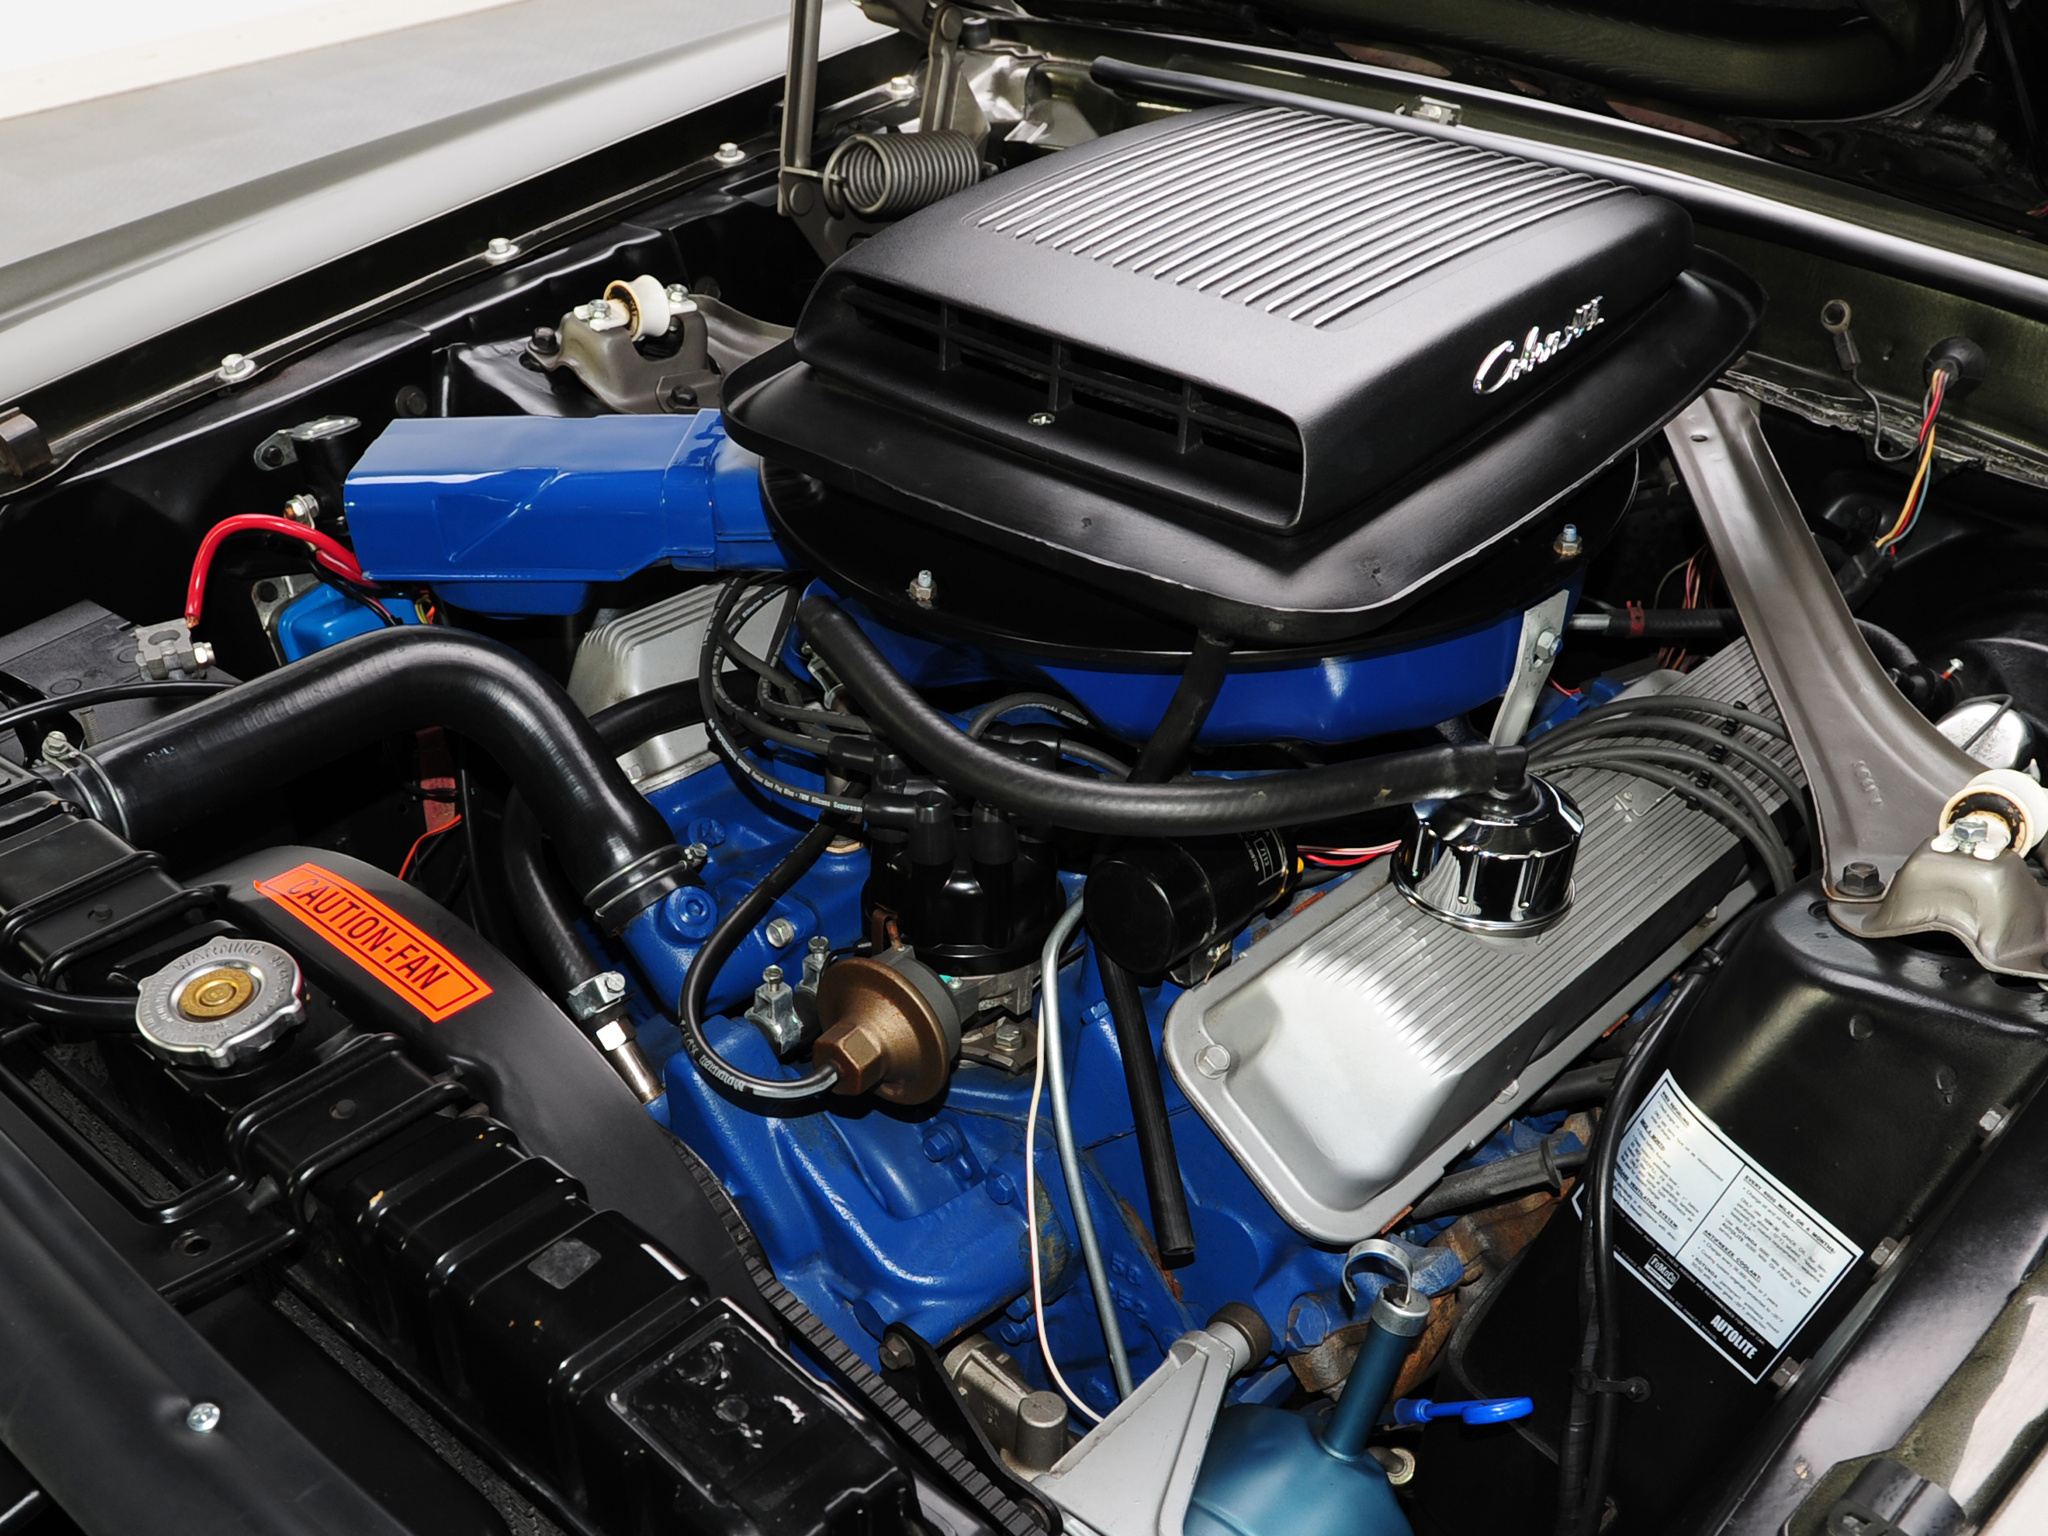 1969 mustang mach 1 428 super cobra jet mach 1 muscle classic engine r wallpaper 2048x1536 134102 wallpaperup - Ford Mustang Cobra Jet Engine